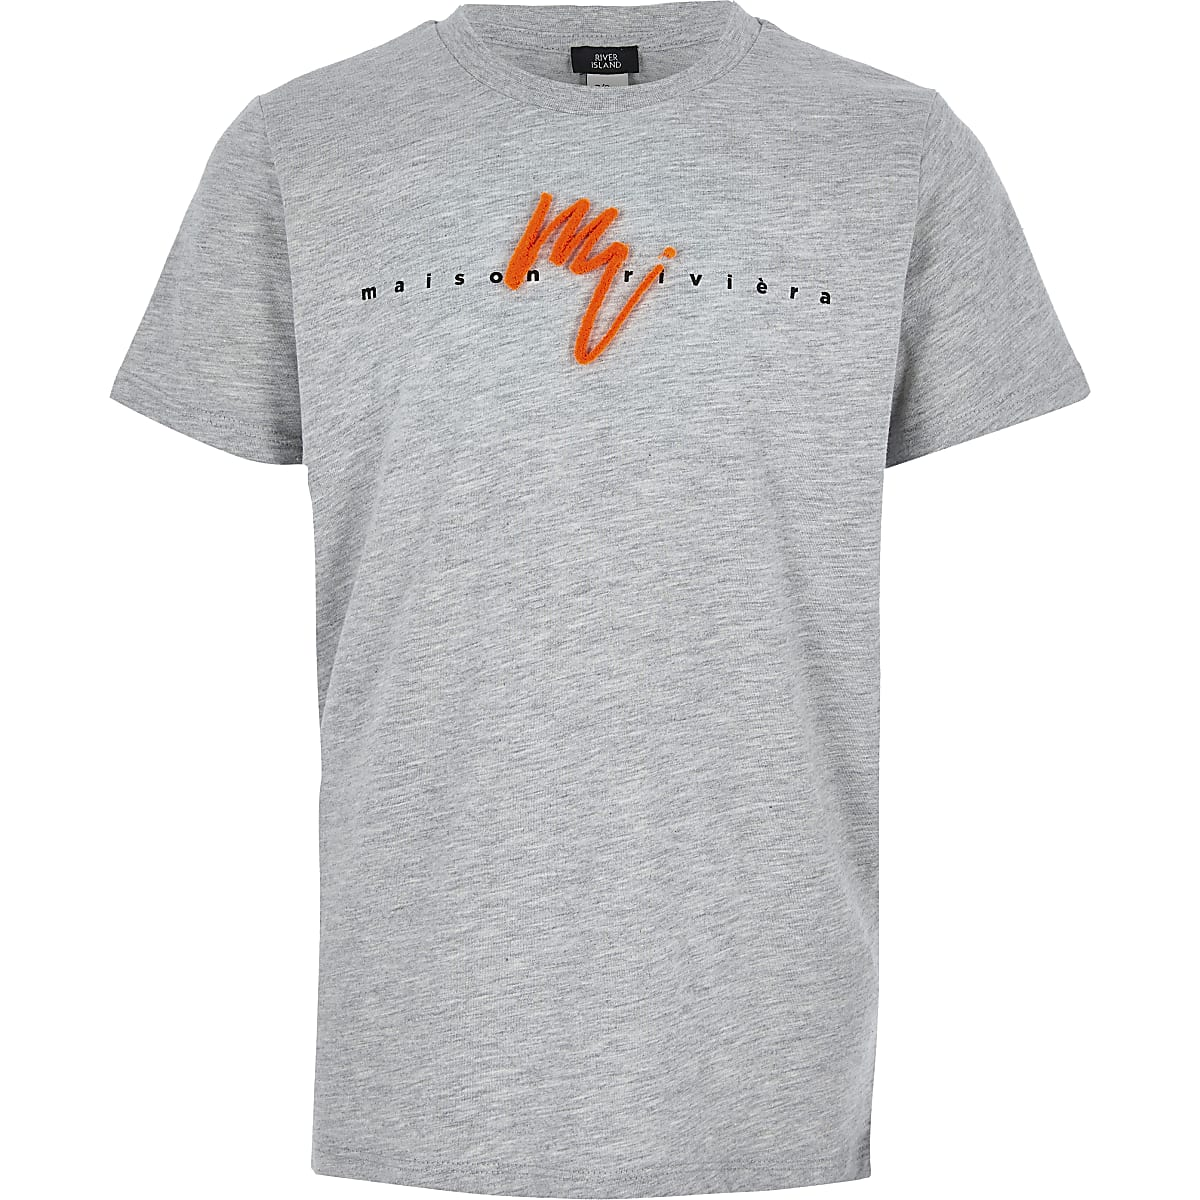 Boys grey neon Maison Riviera T-shirt